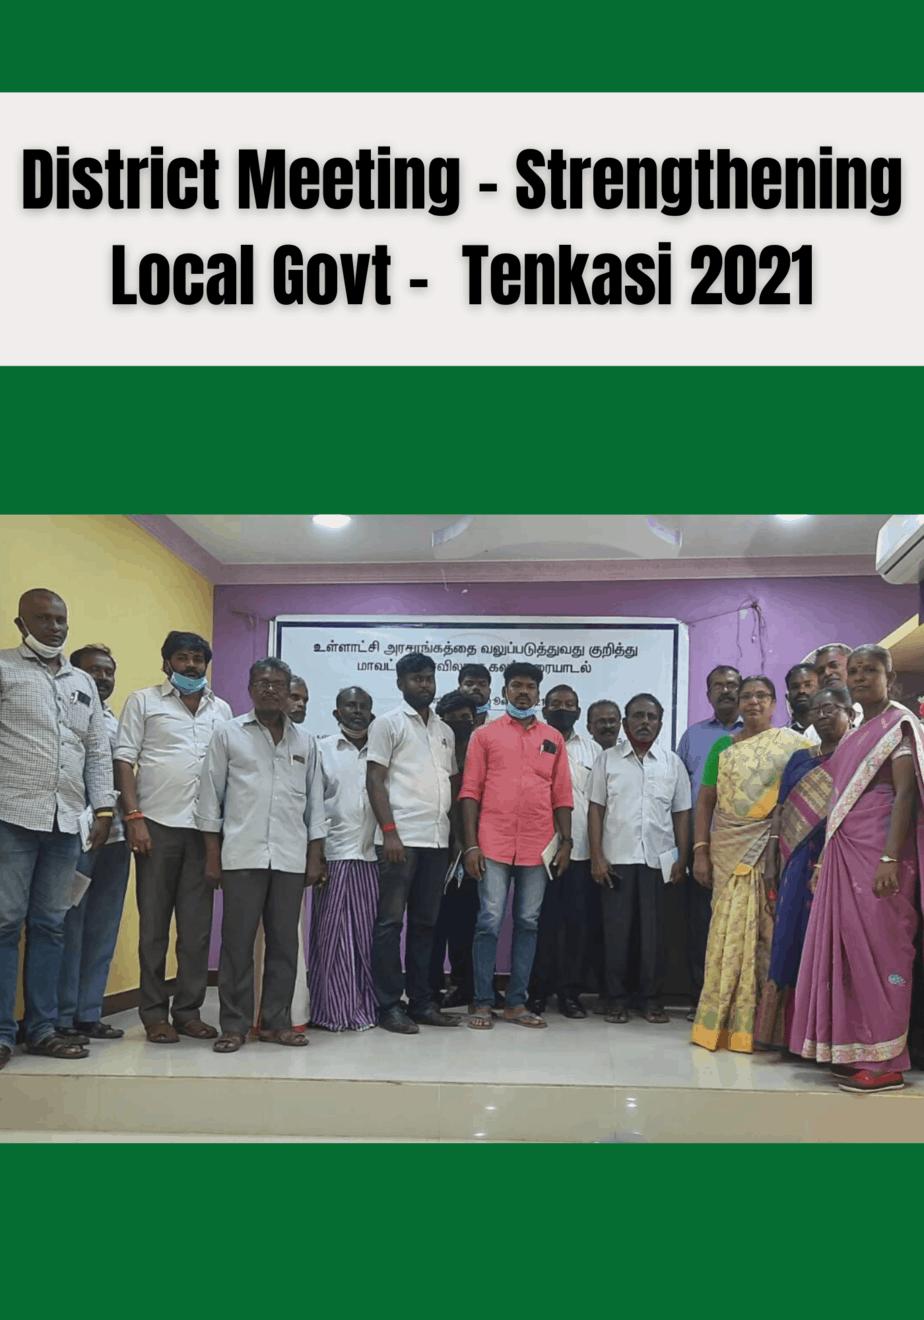 Strengthening local government 2021 – Tenkasi